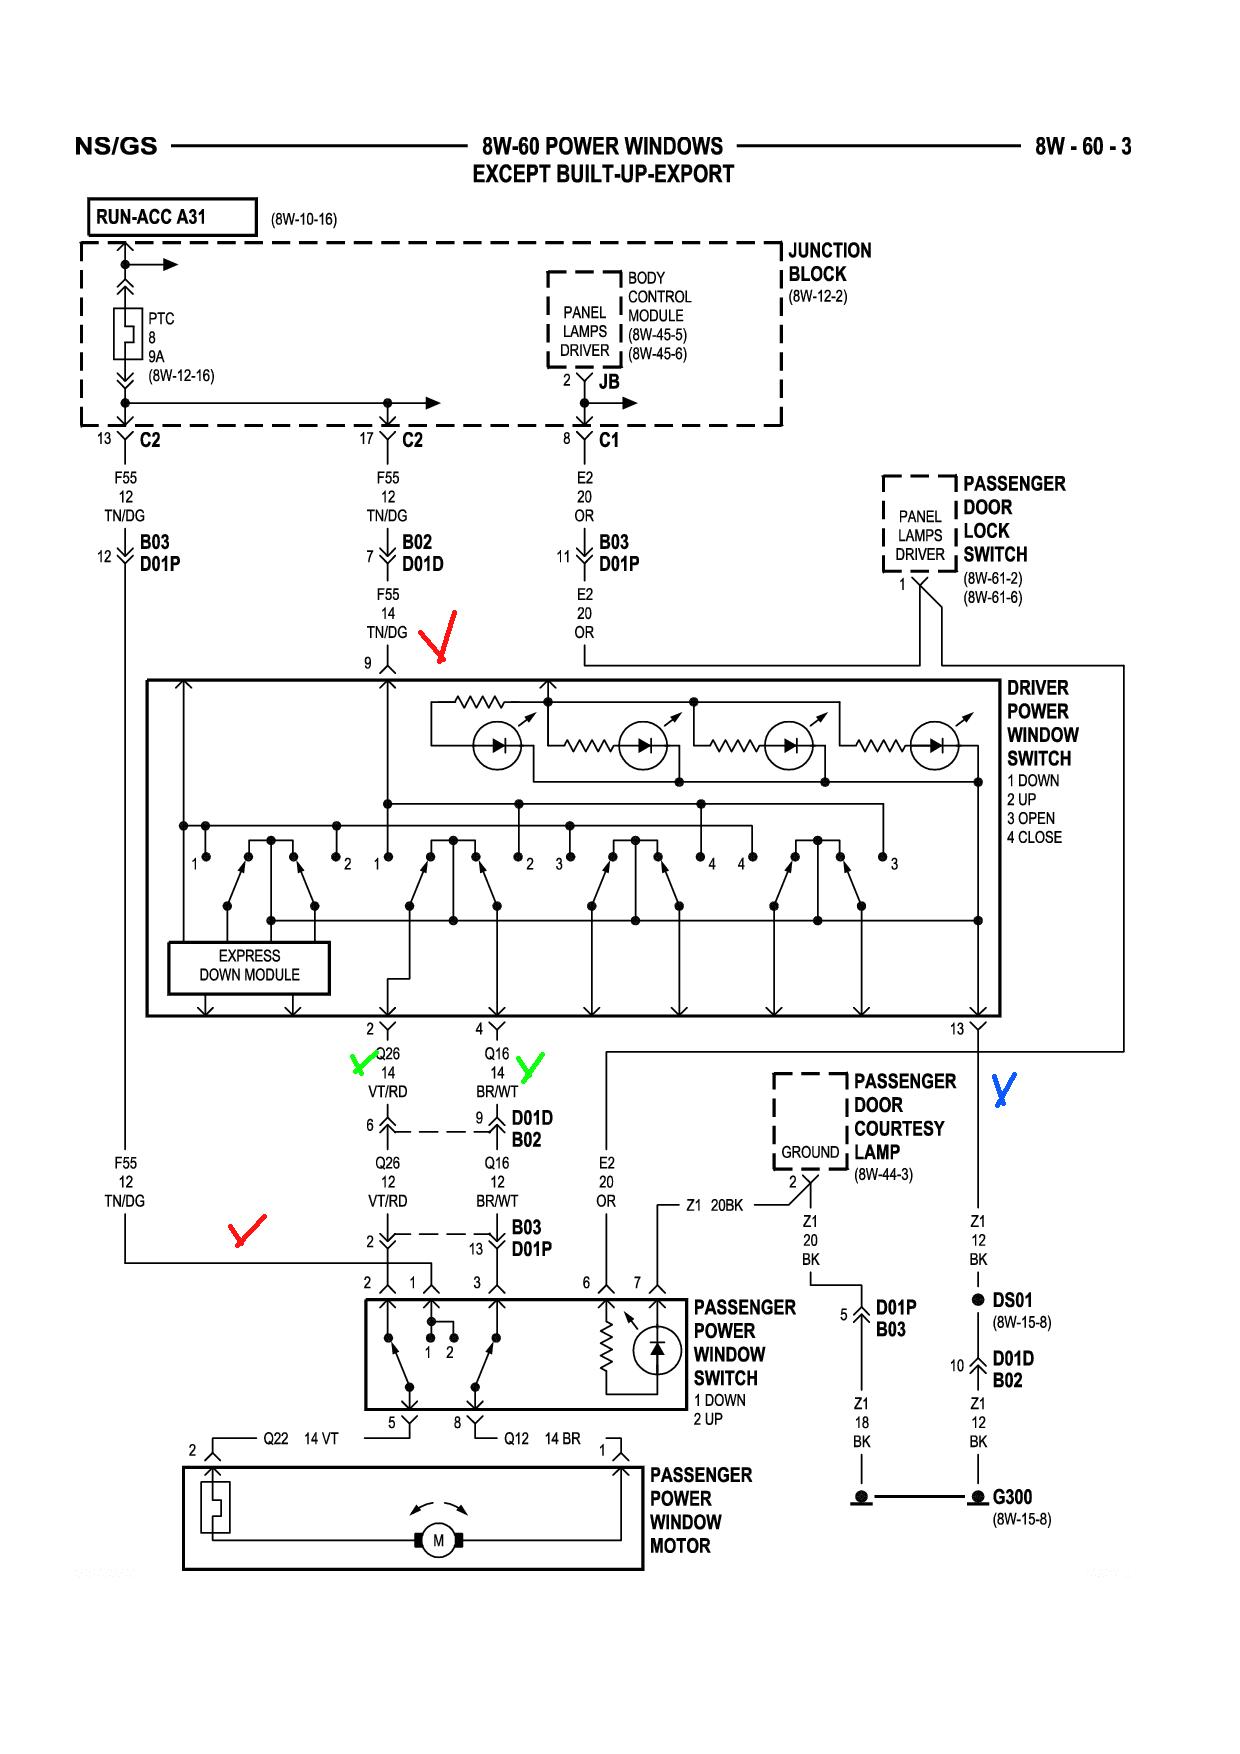 Dodge Caravan Cooling System Diagram - Wiring Site Resource | 2002 Dodge Grand Caravan Transmission Control Module Wiring |  | Wiring Site Resource